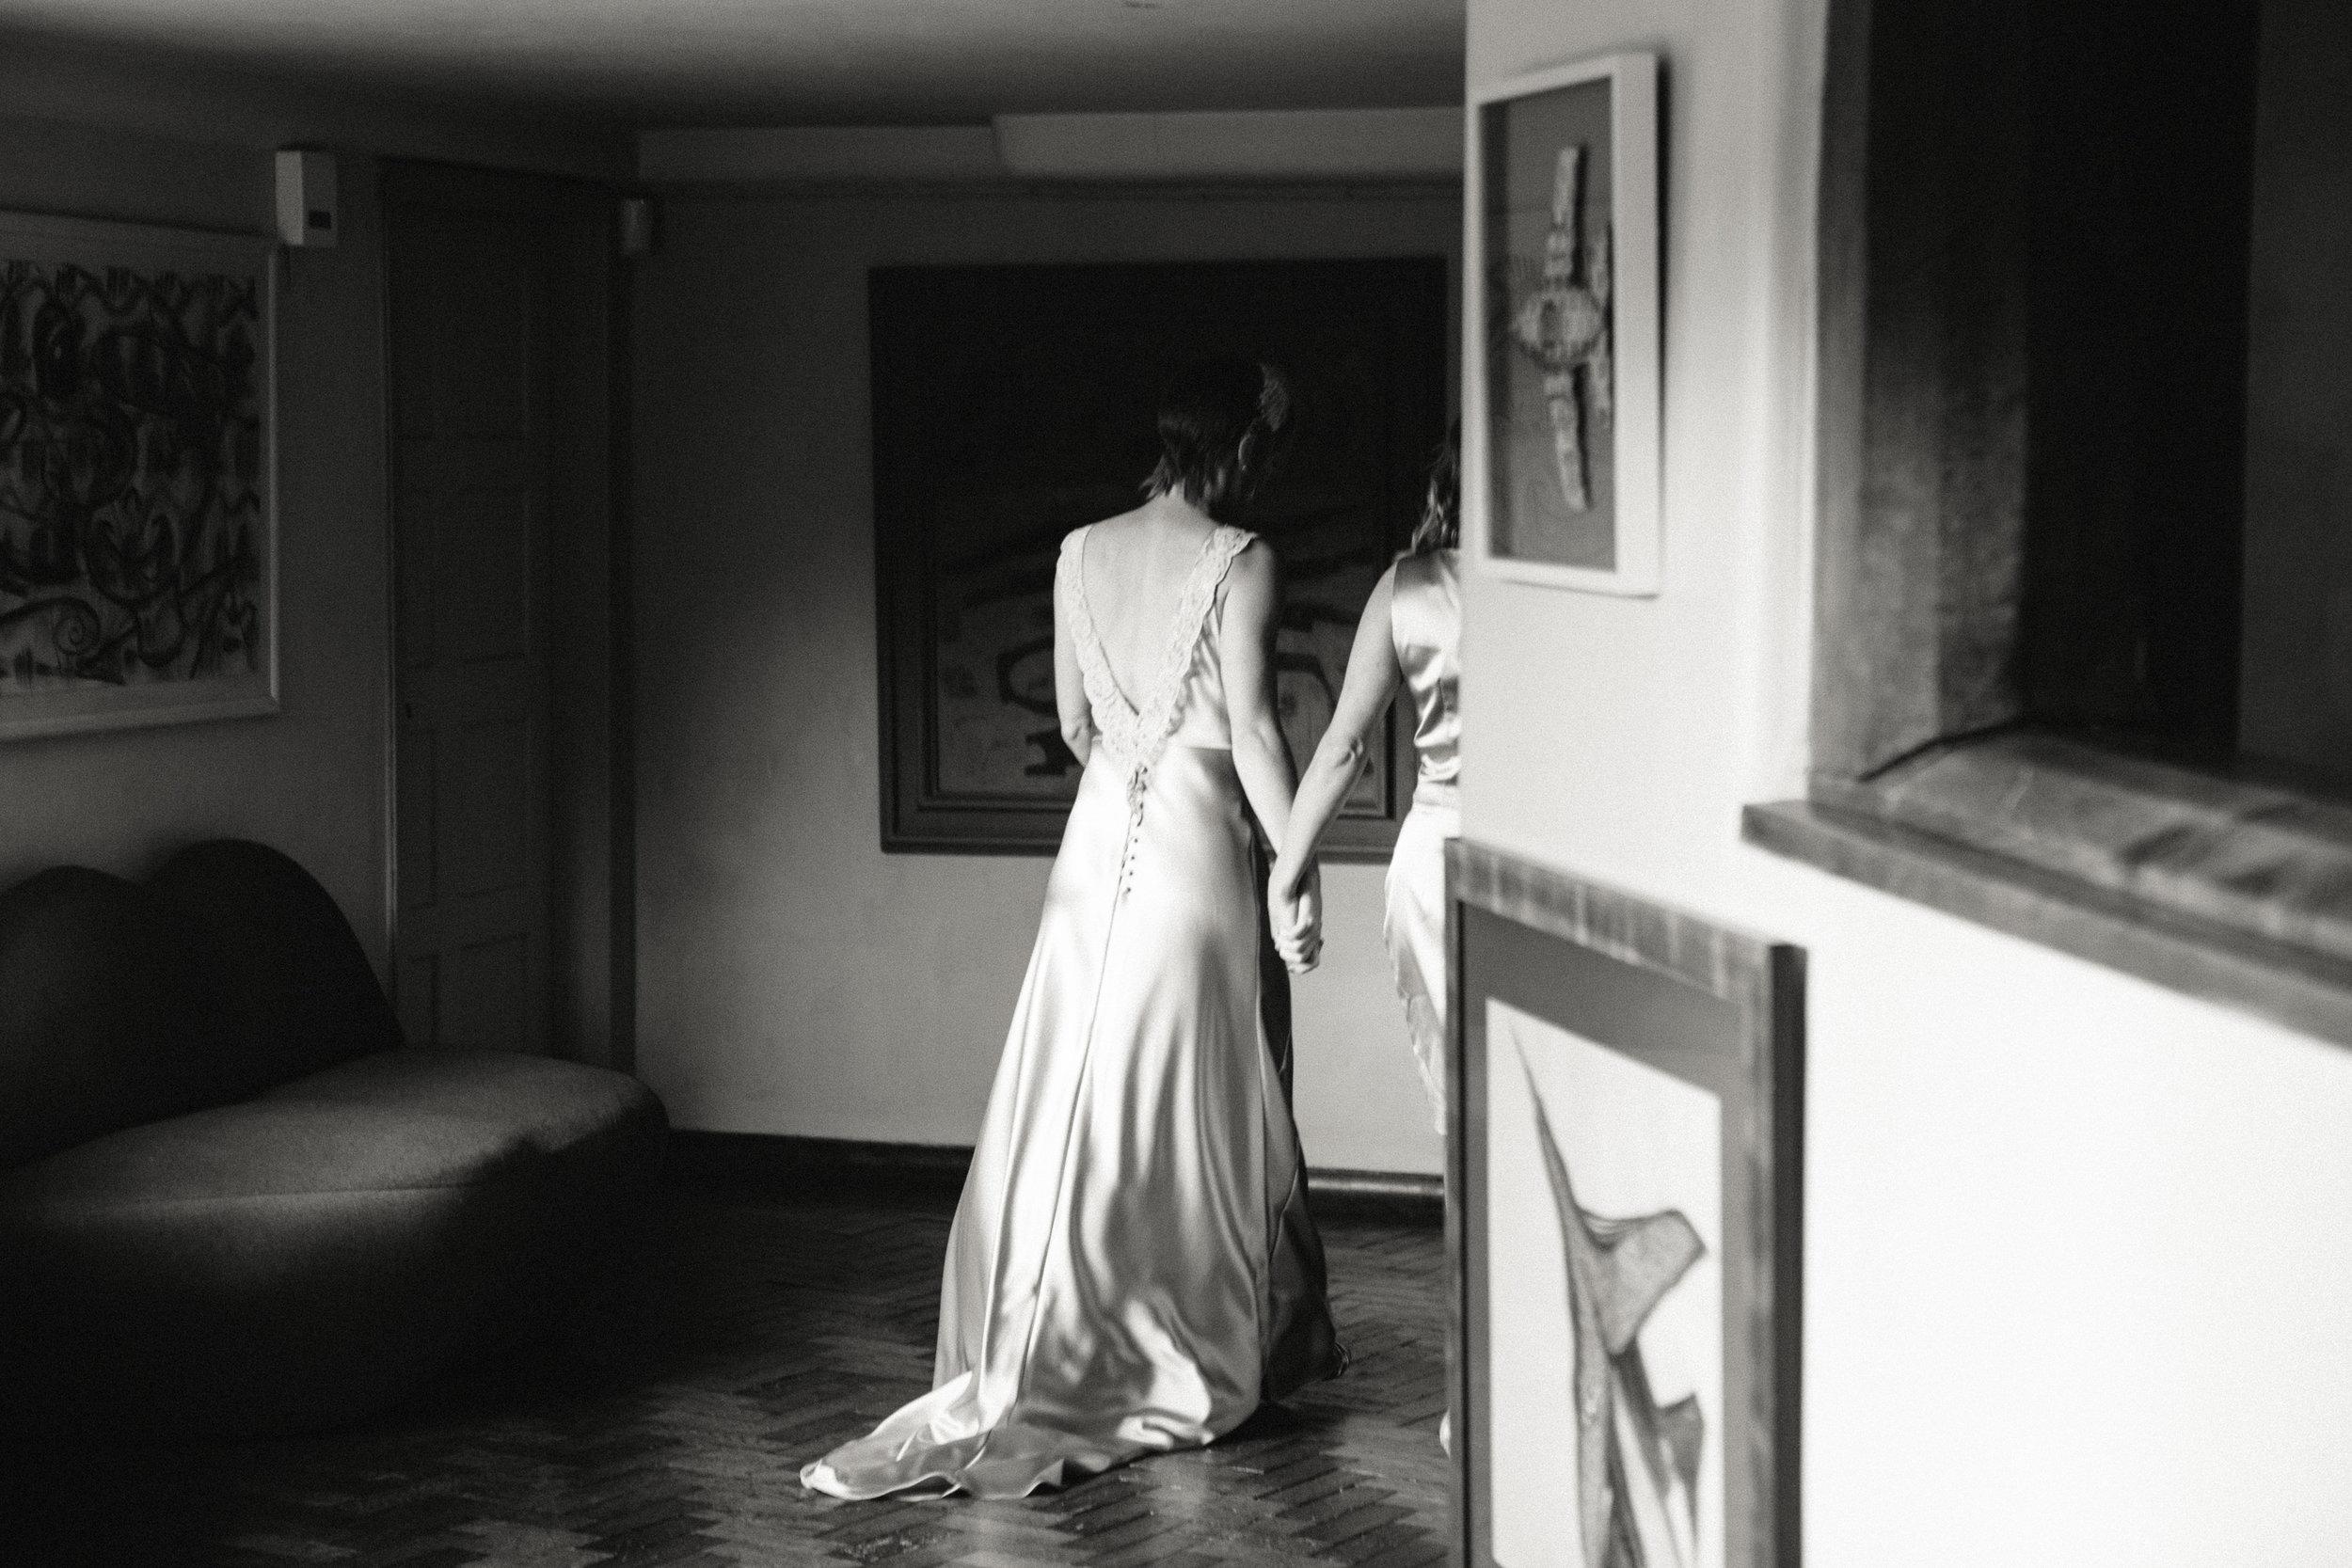 Kate-Beaumont-Sheffield-Honeysuckle-bias-cut-wedding-dress-oyster-Rosie3.jpg